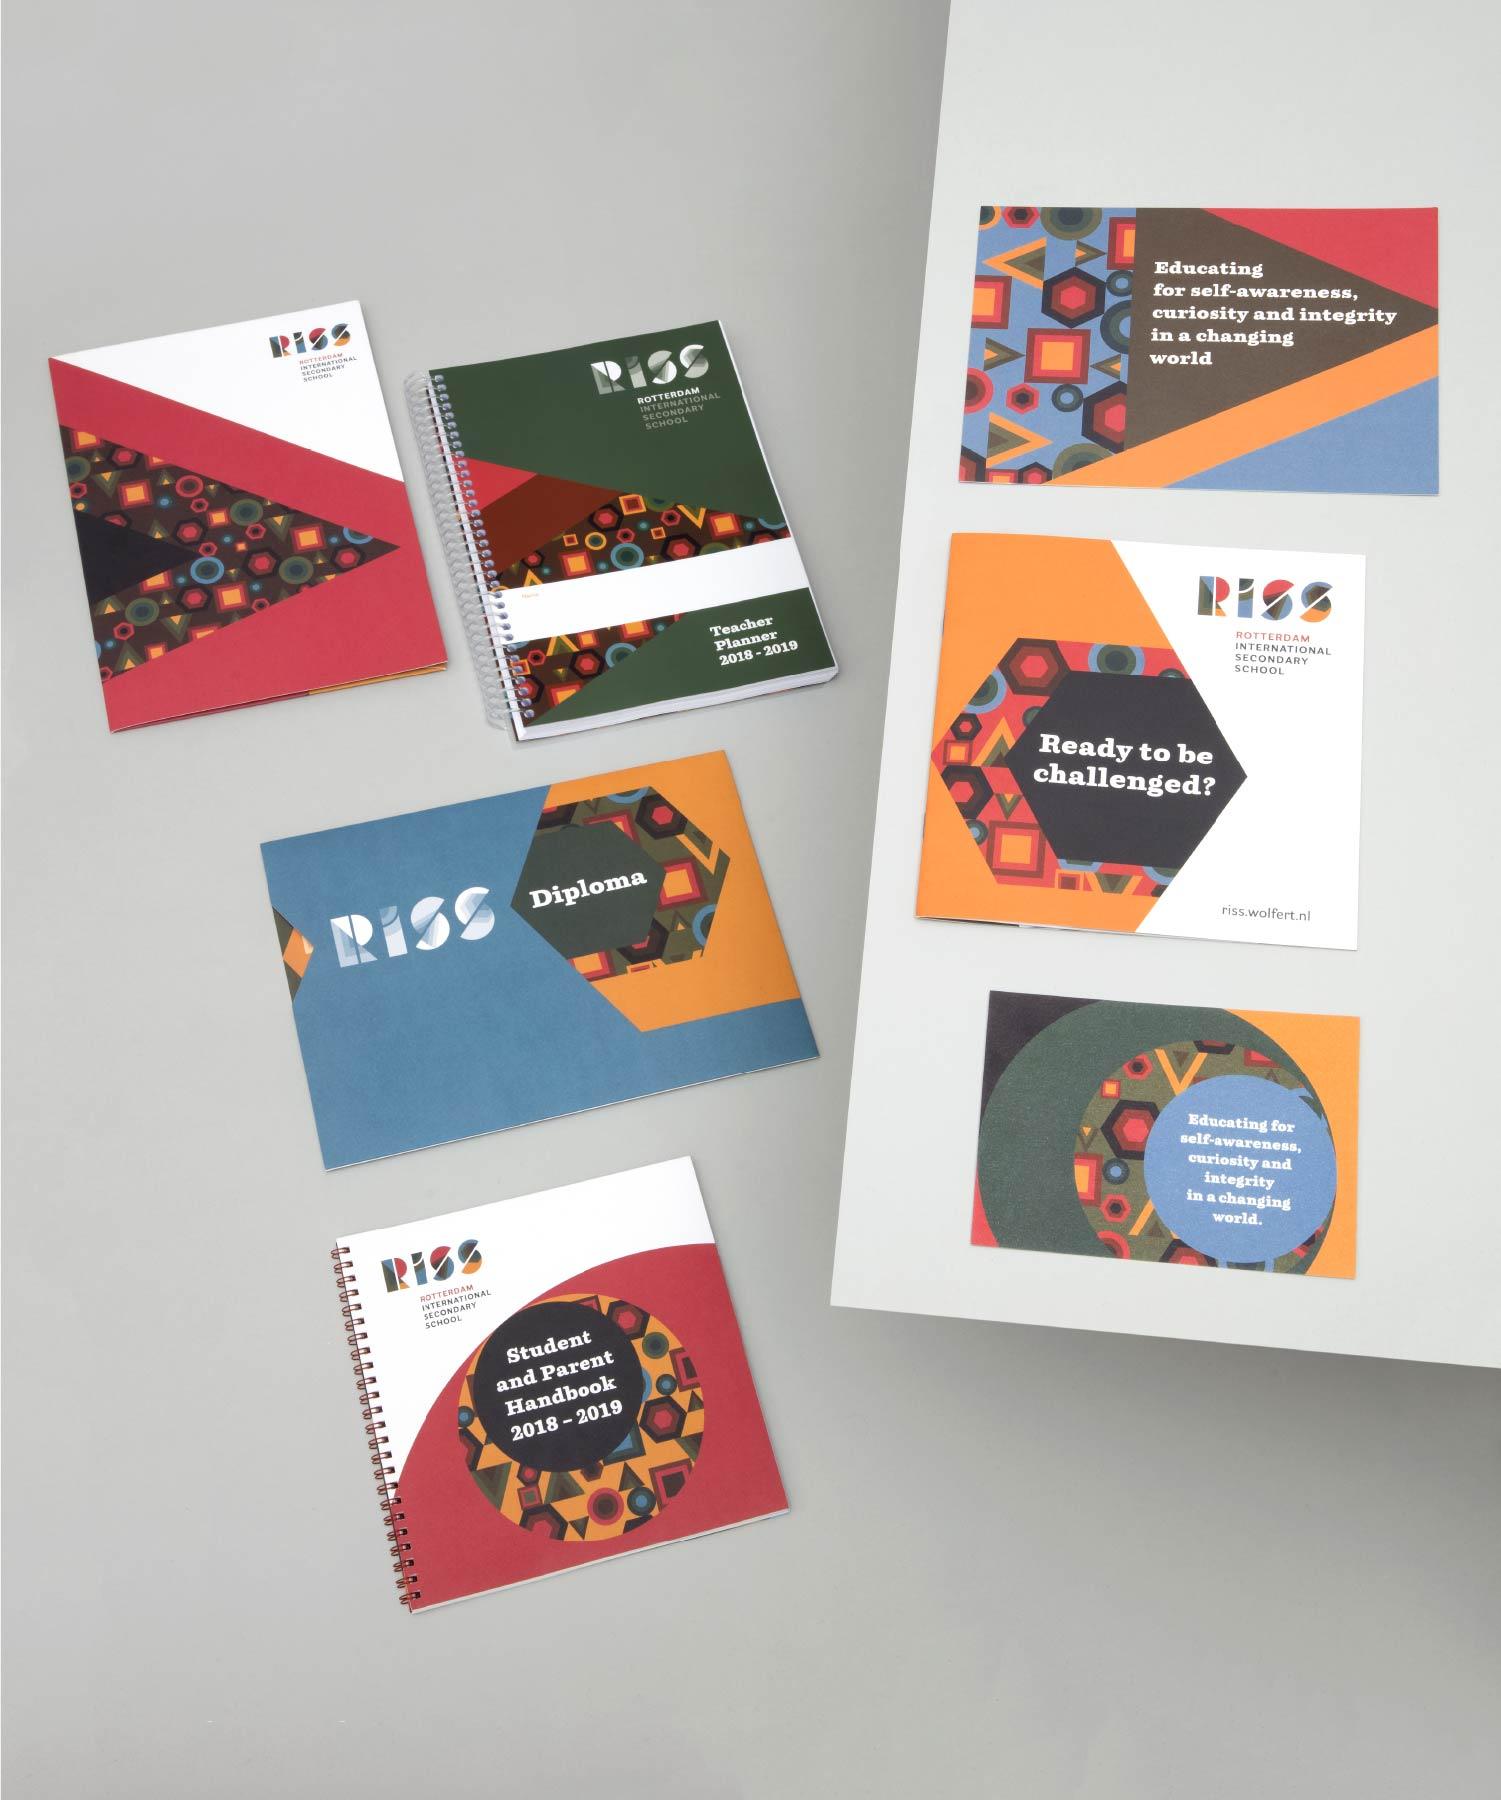 RISS Brochure Agenda Flyer Diploma M-space